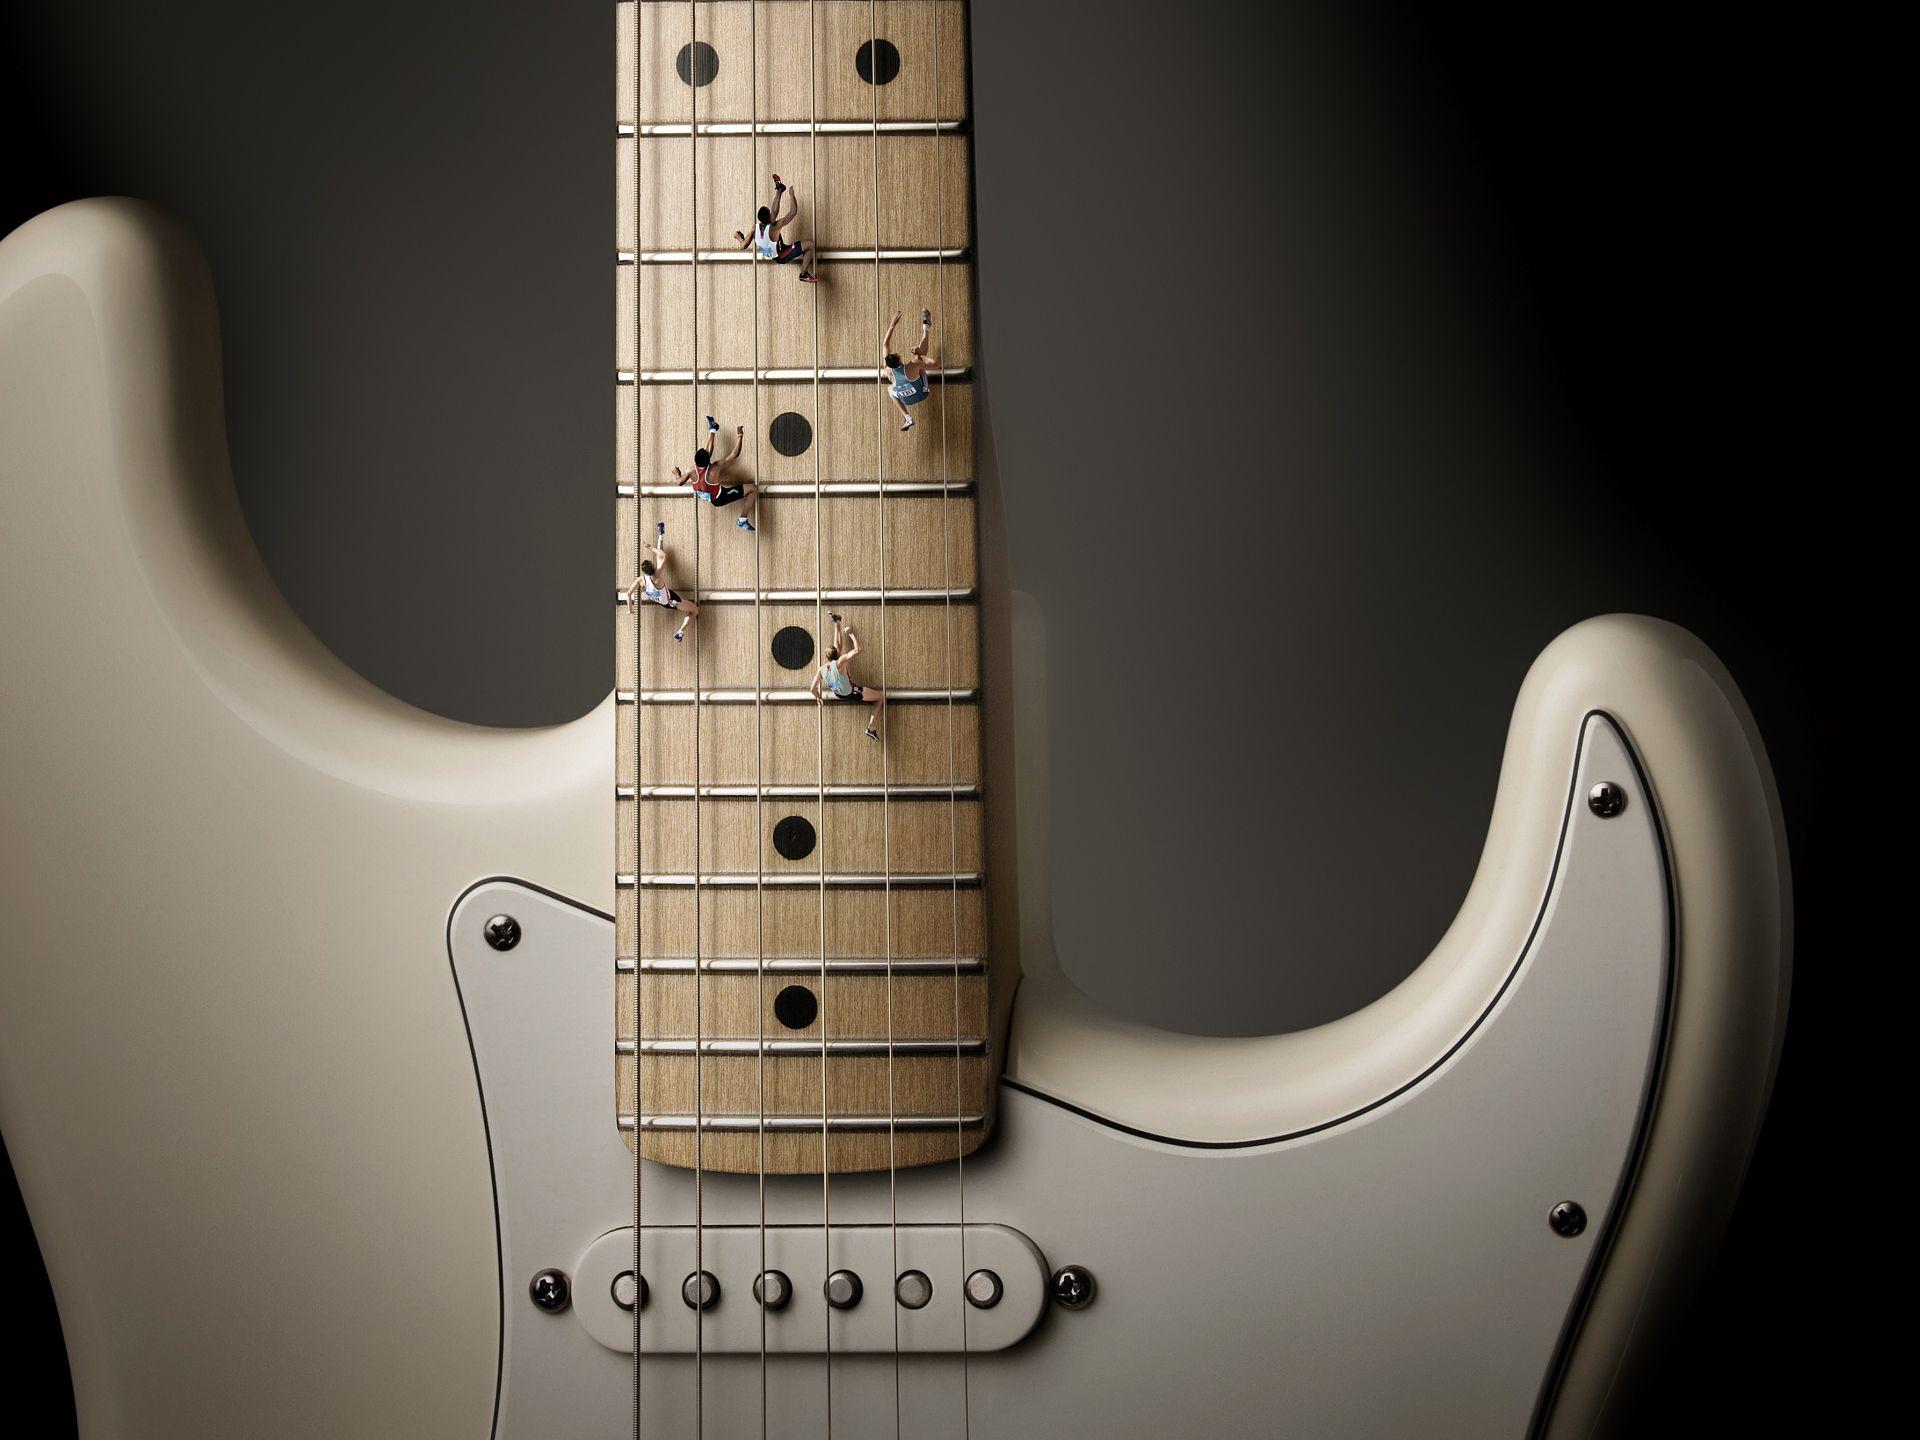 Electric Guitar white, Cool Wallpaper